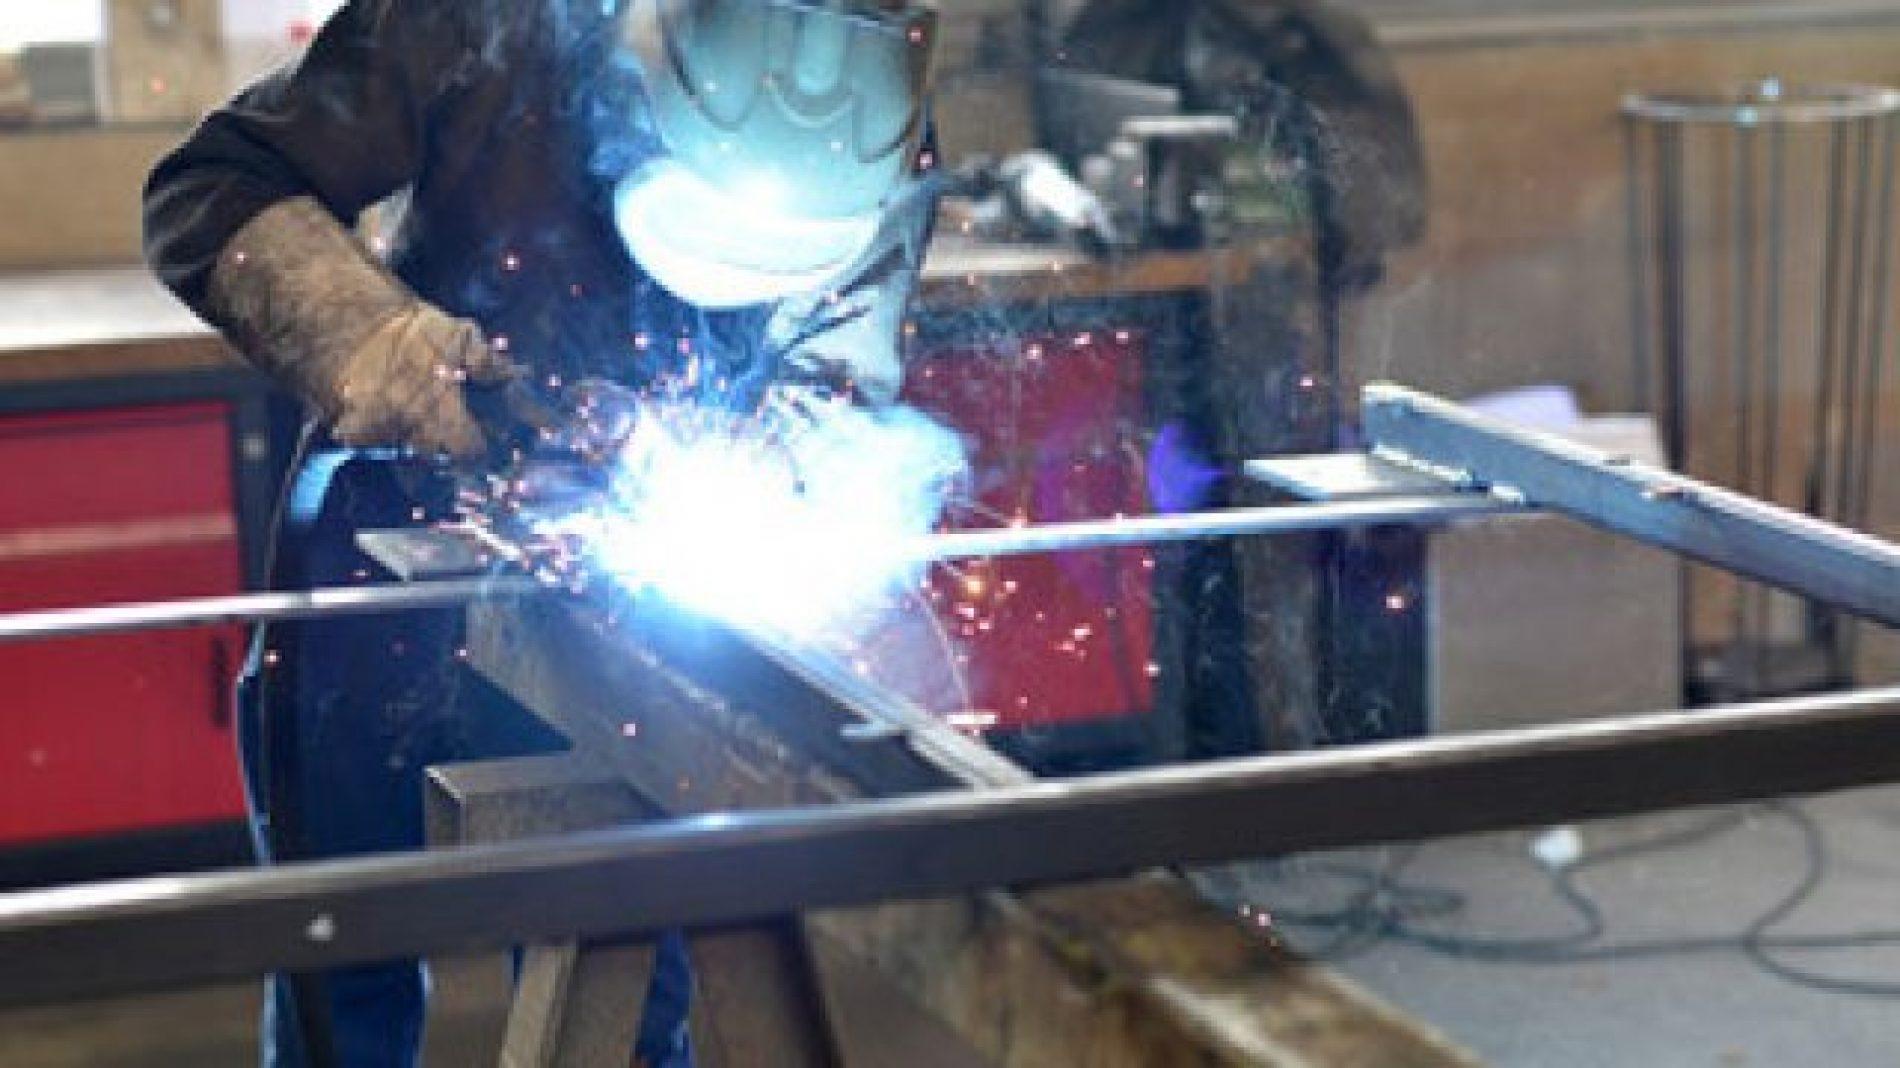 Kamen temeljac za novi pogon fabrike EDNA Metalworking